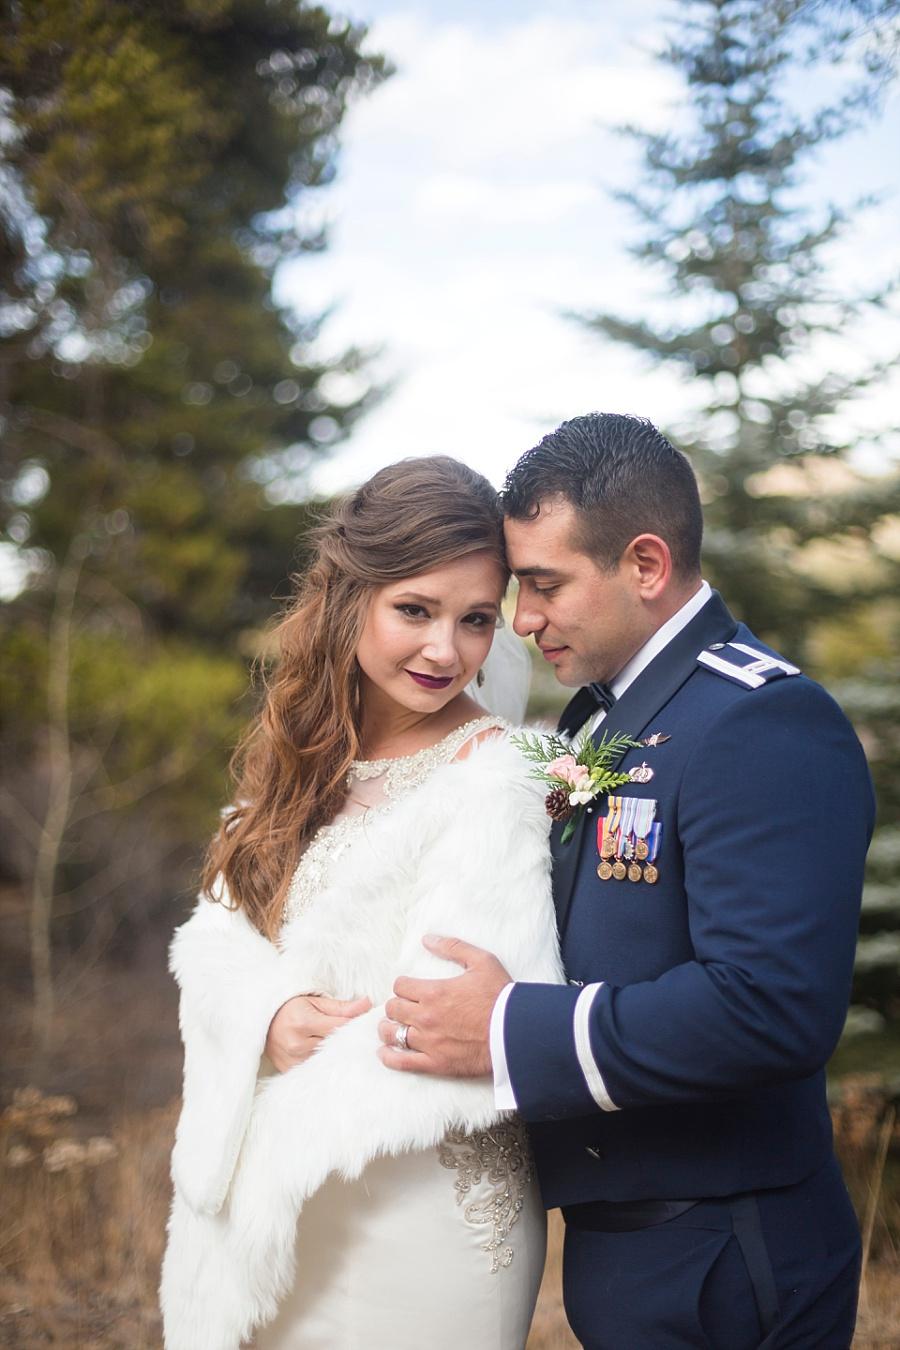 Stacy Anderson Photography Breckenridge Denver Boulder Vail Colorado Travel Lifestyle Elopement Vow renewal Family Wedding Photographer_0016.jpg